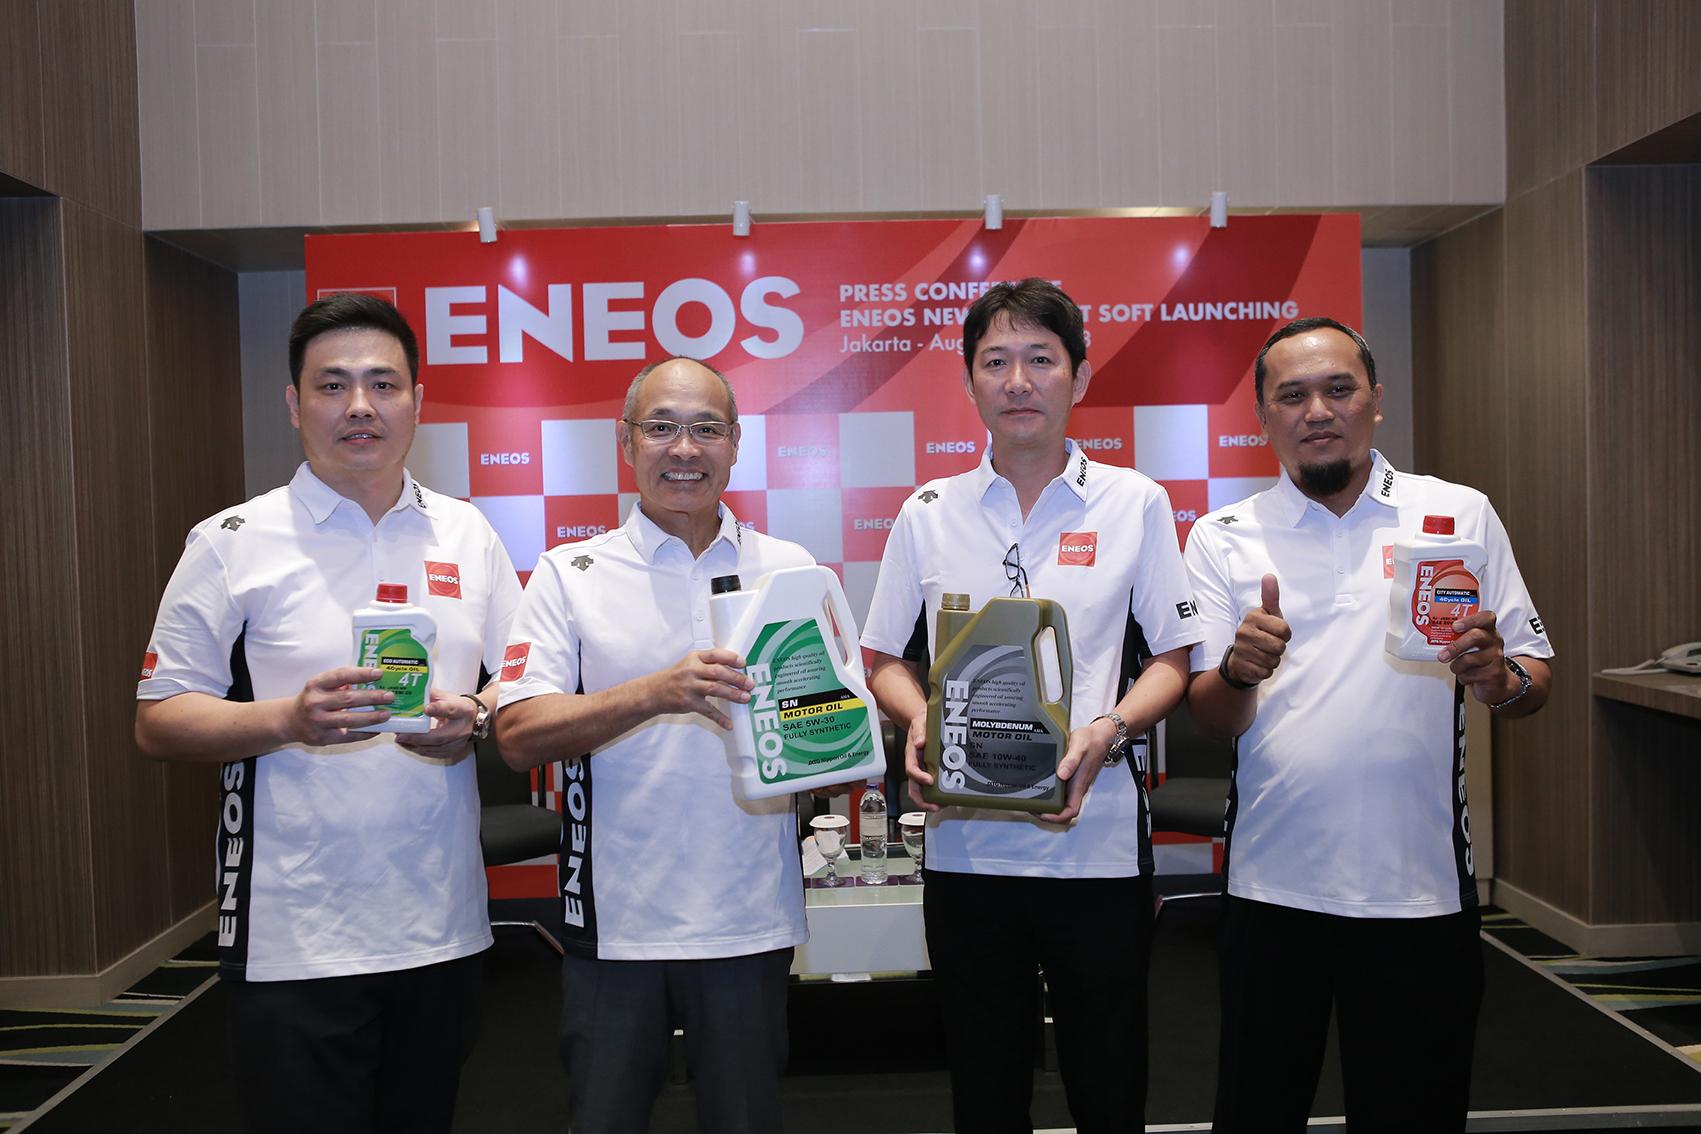 Launchong ENEOS